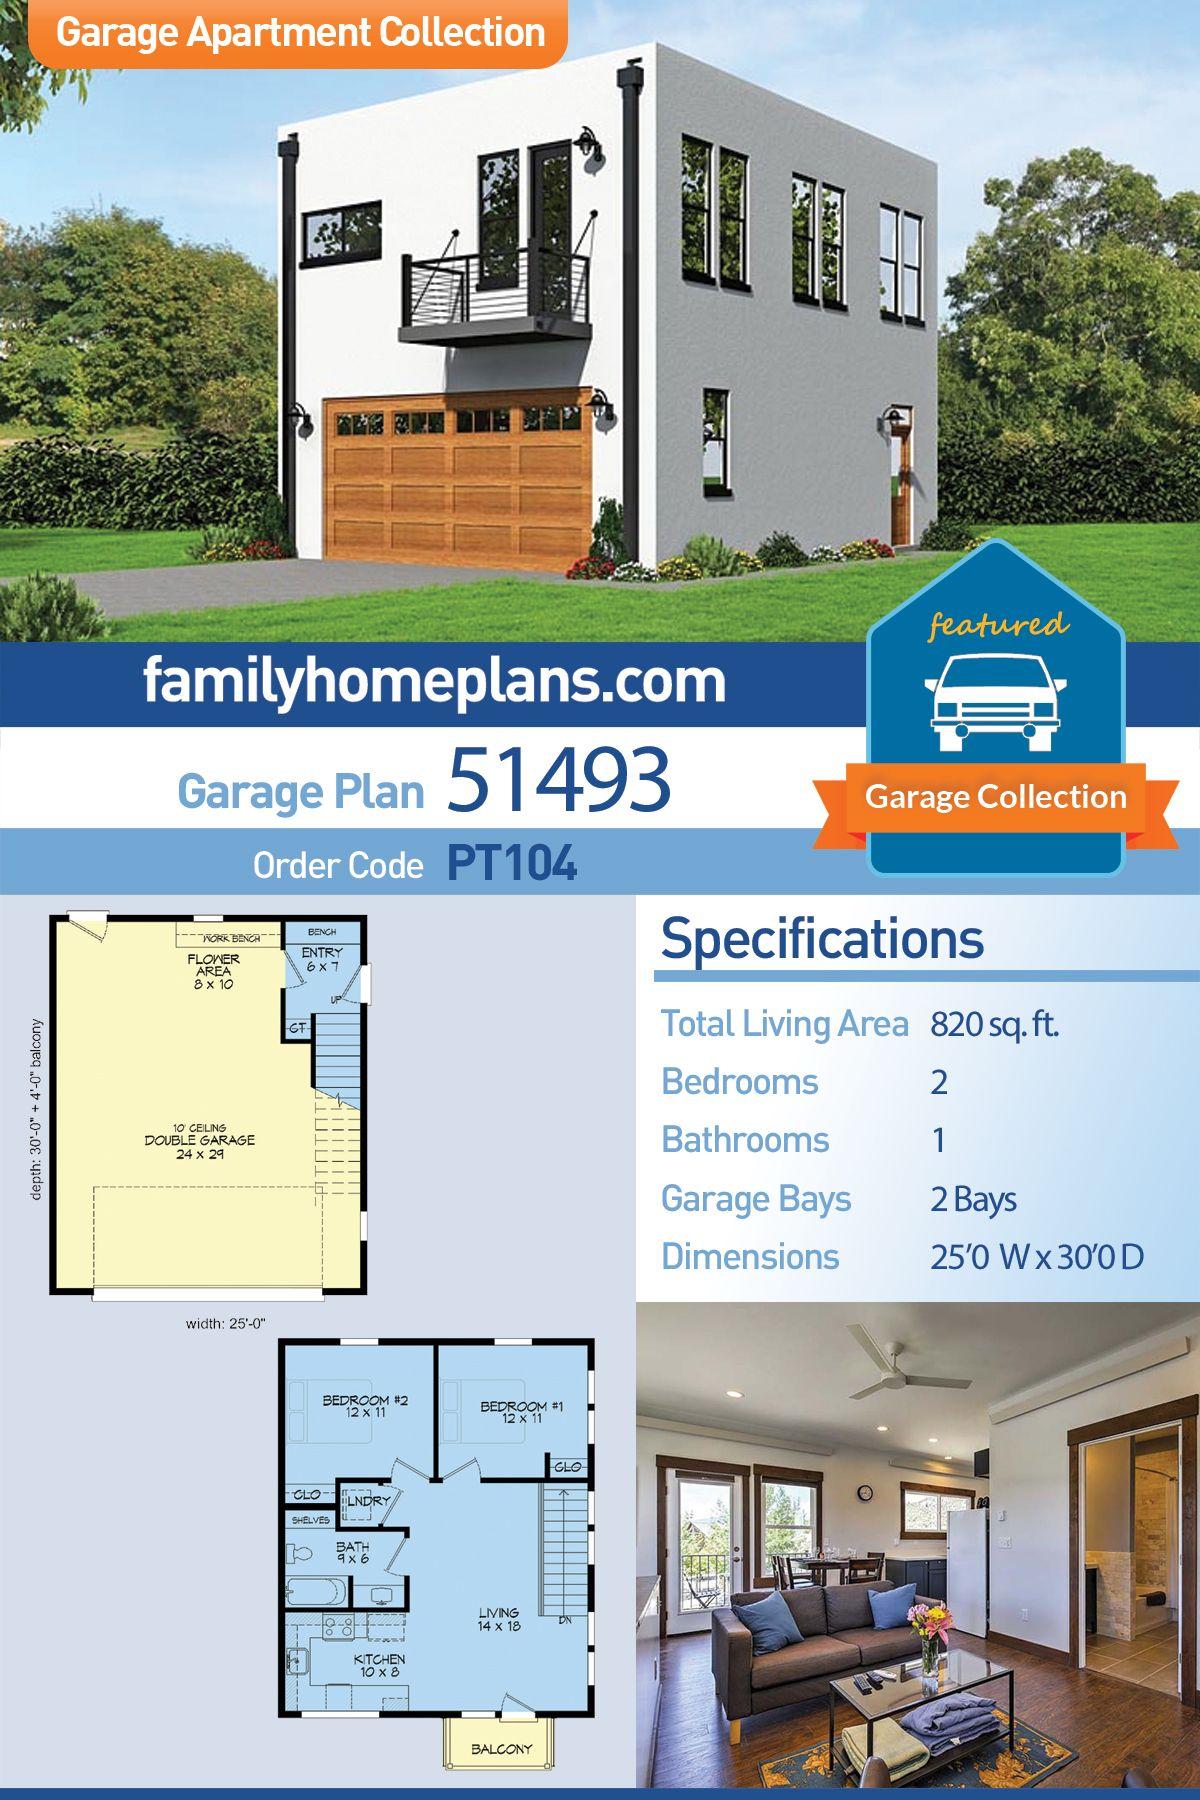 Modern Style Garage Living Plan 51493 With 2 Bed 1 Bath 2 Car Garage Garage House Plans Garage Apartment Plan Garage Design